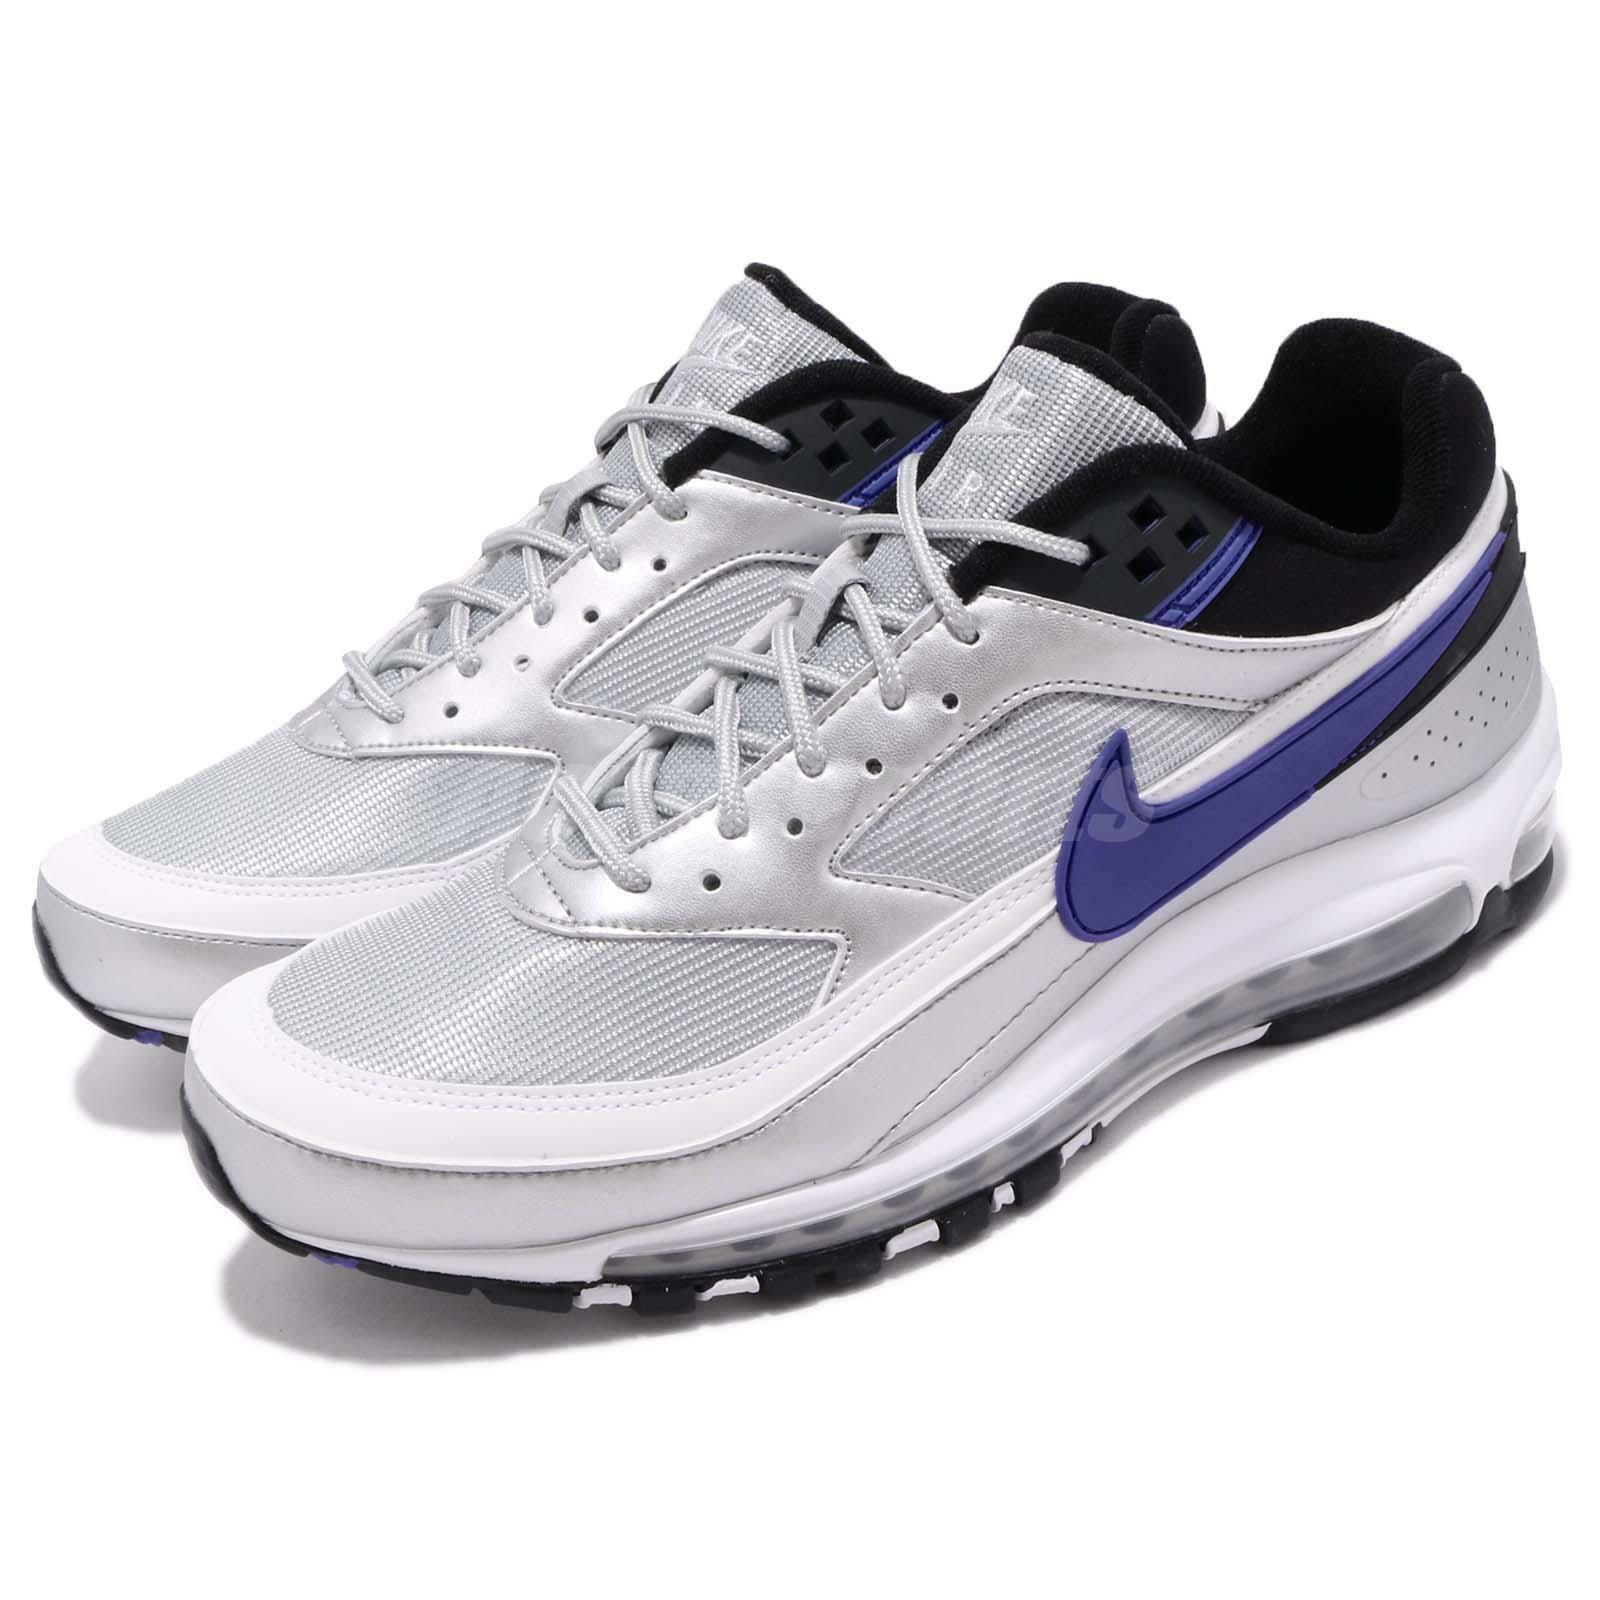 online retailer 60b89 72da2 Nike Air Max 97 BW Metallic Metallic Metallic Silver Violet Running Shoes  Sneakers AO2406-002 6995d8